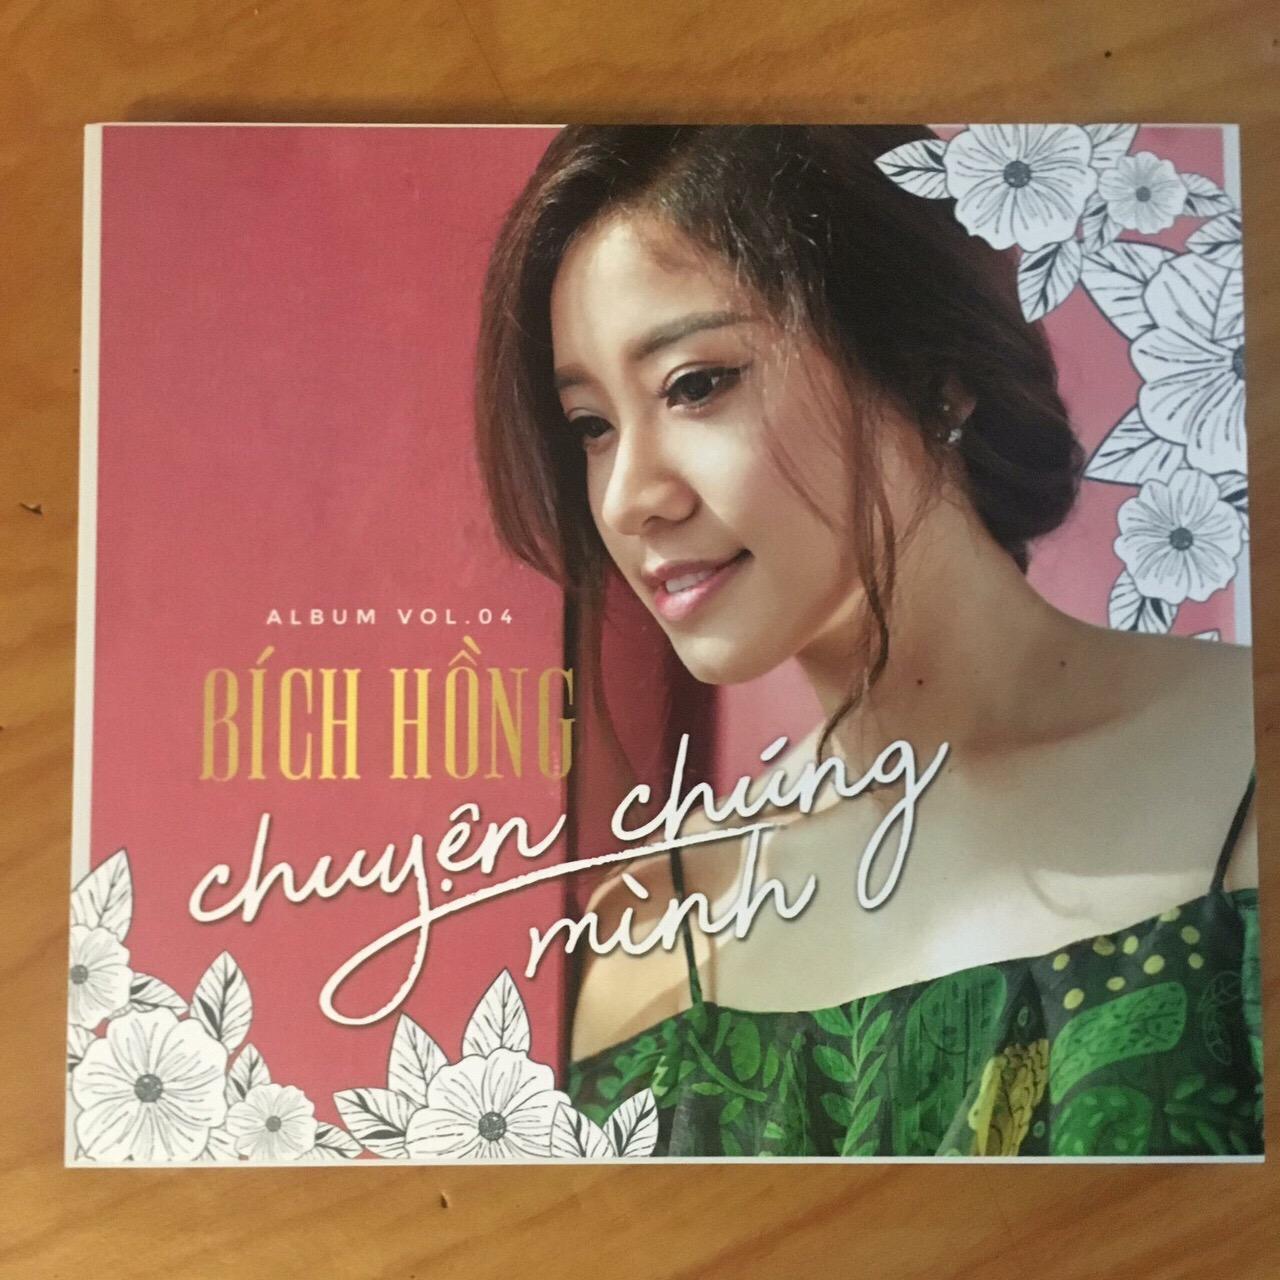 cd-bich-hong-chuyen-chung-minh